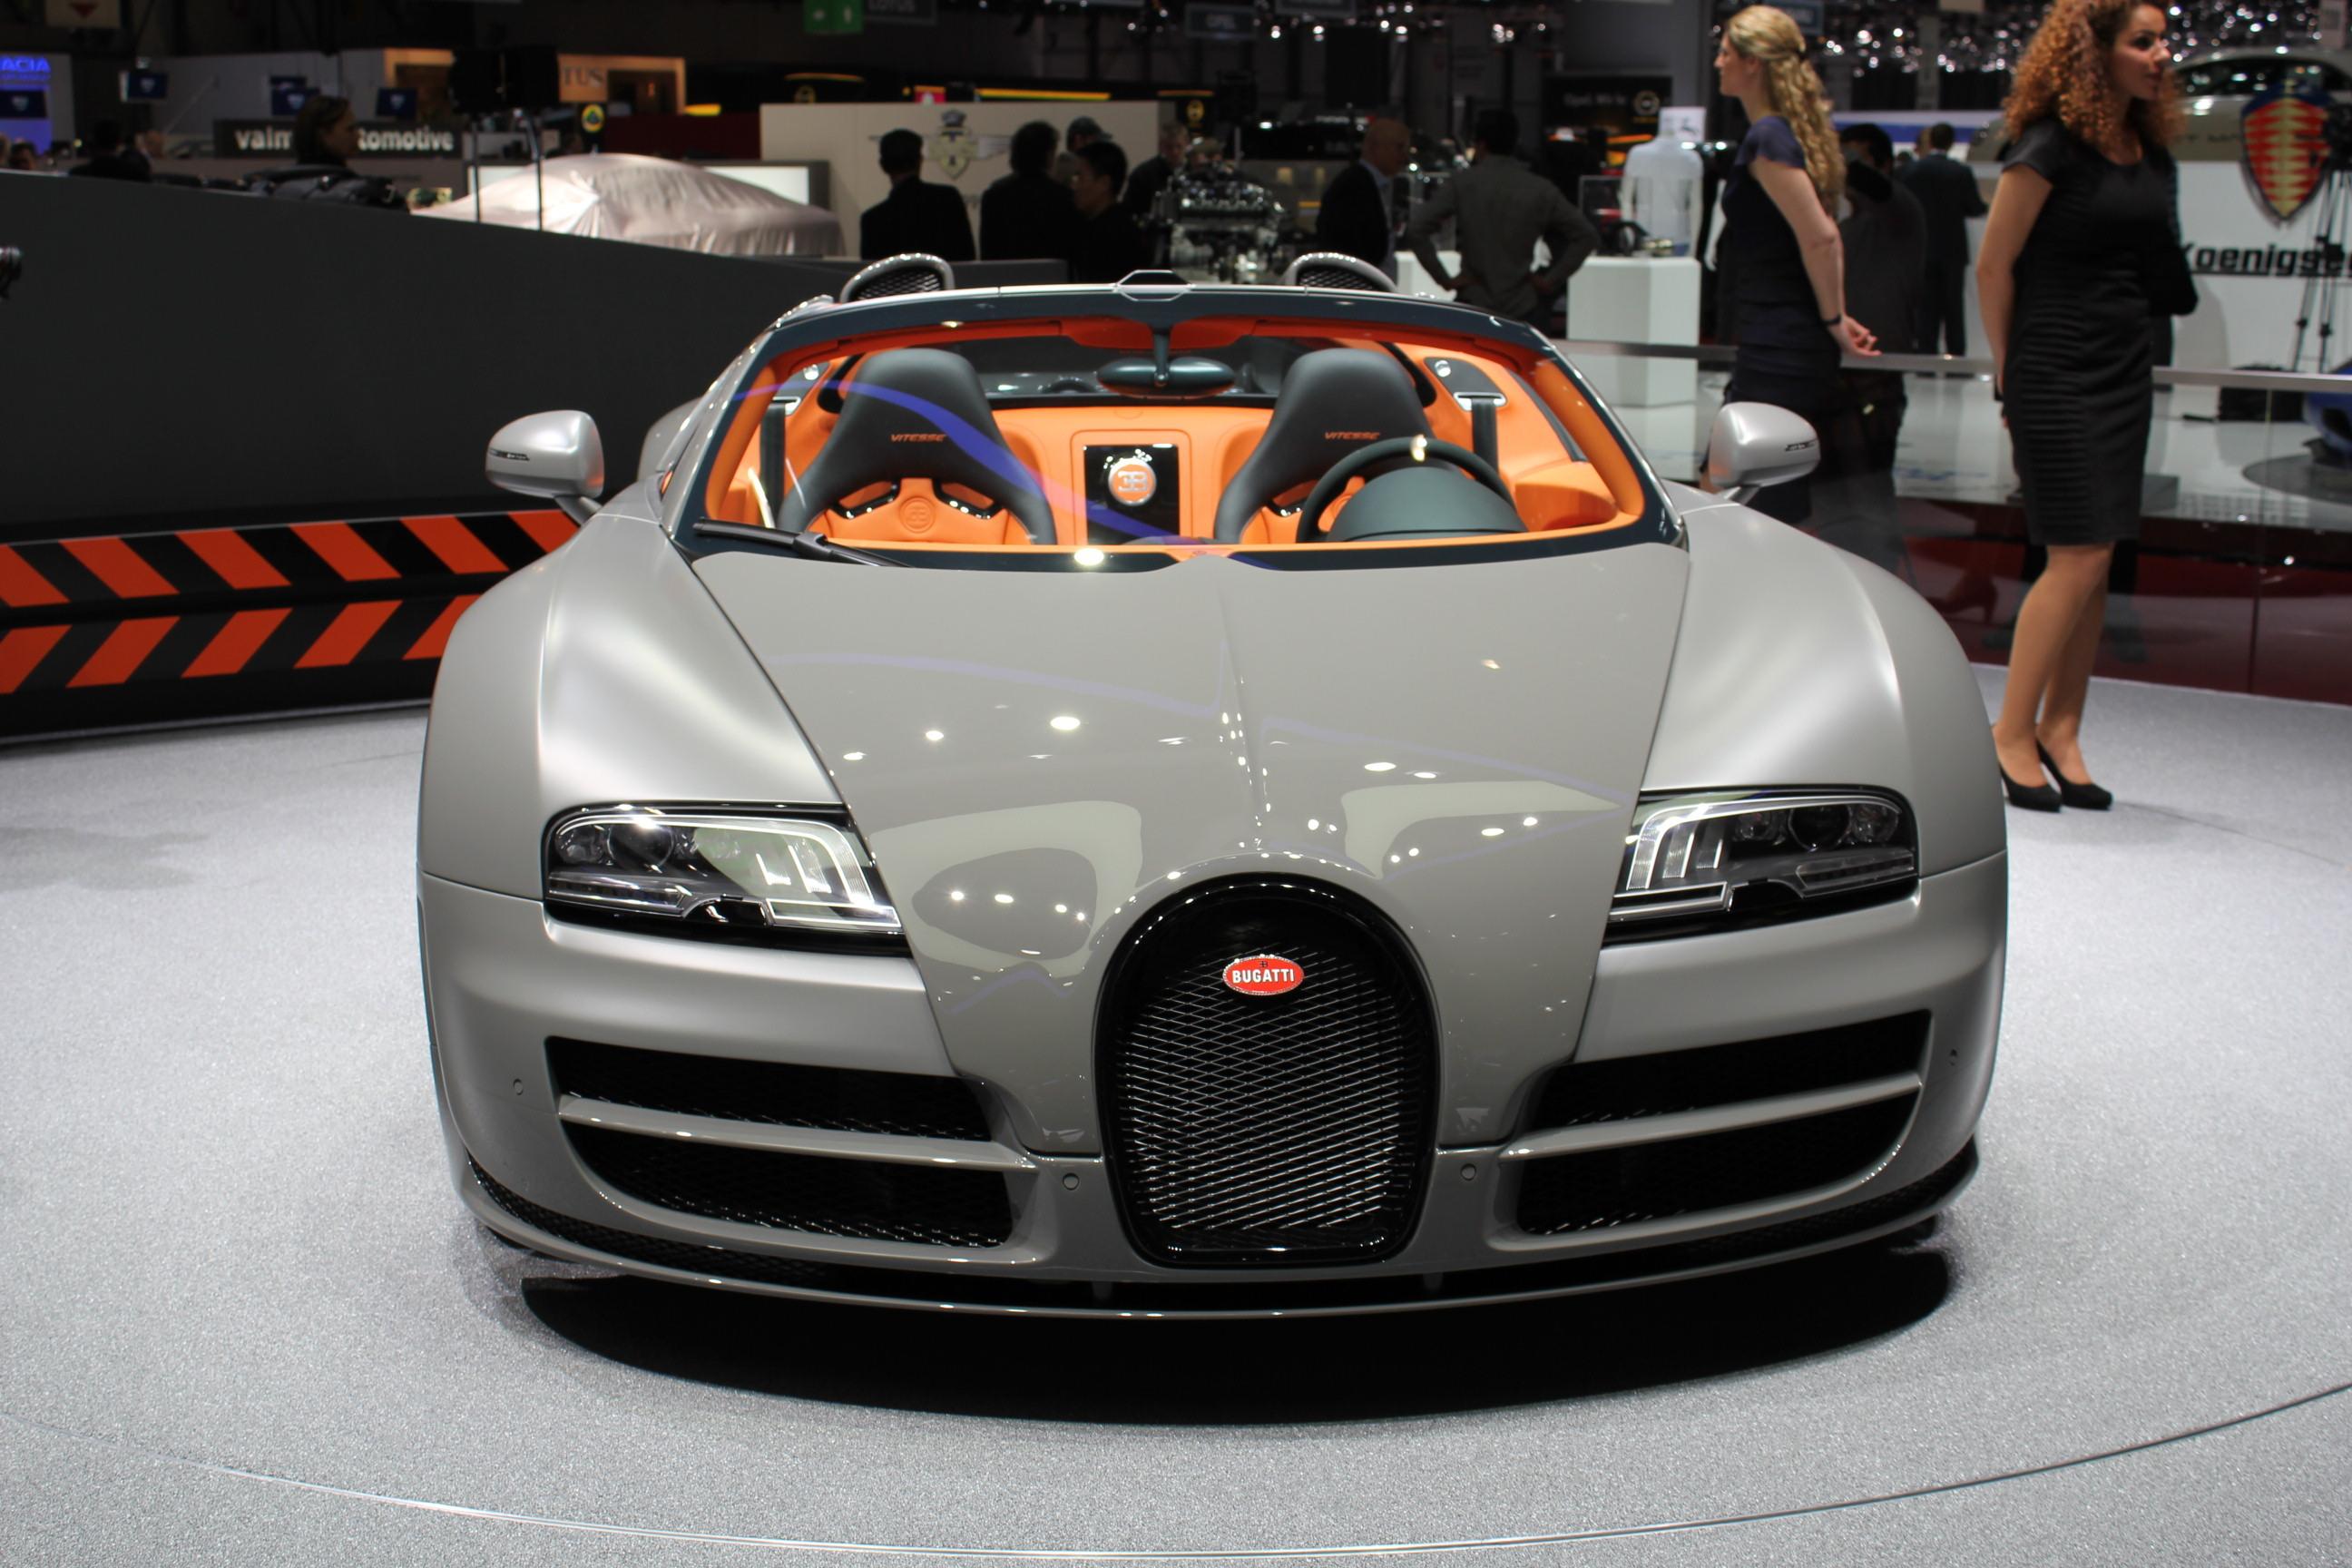 S0-En-direct-de-Geneve-2012-Bugatti-Veyron-Grand-Sport-Vitesse-une-version-de-plus-256653 Exciting Bugatti Veyron Grand Sport Vitesse Fiche Technique Cars Trend